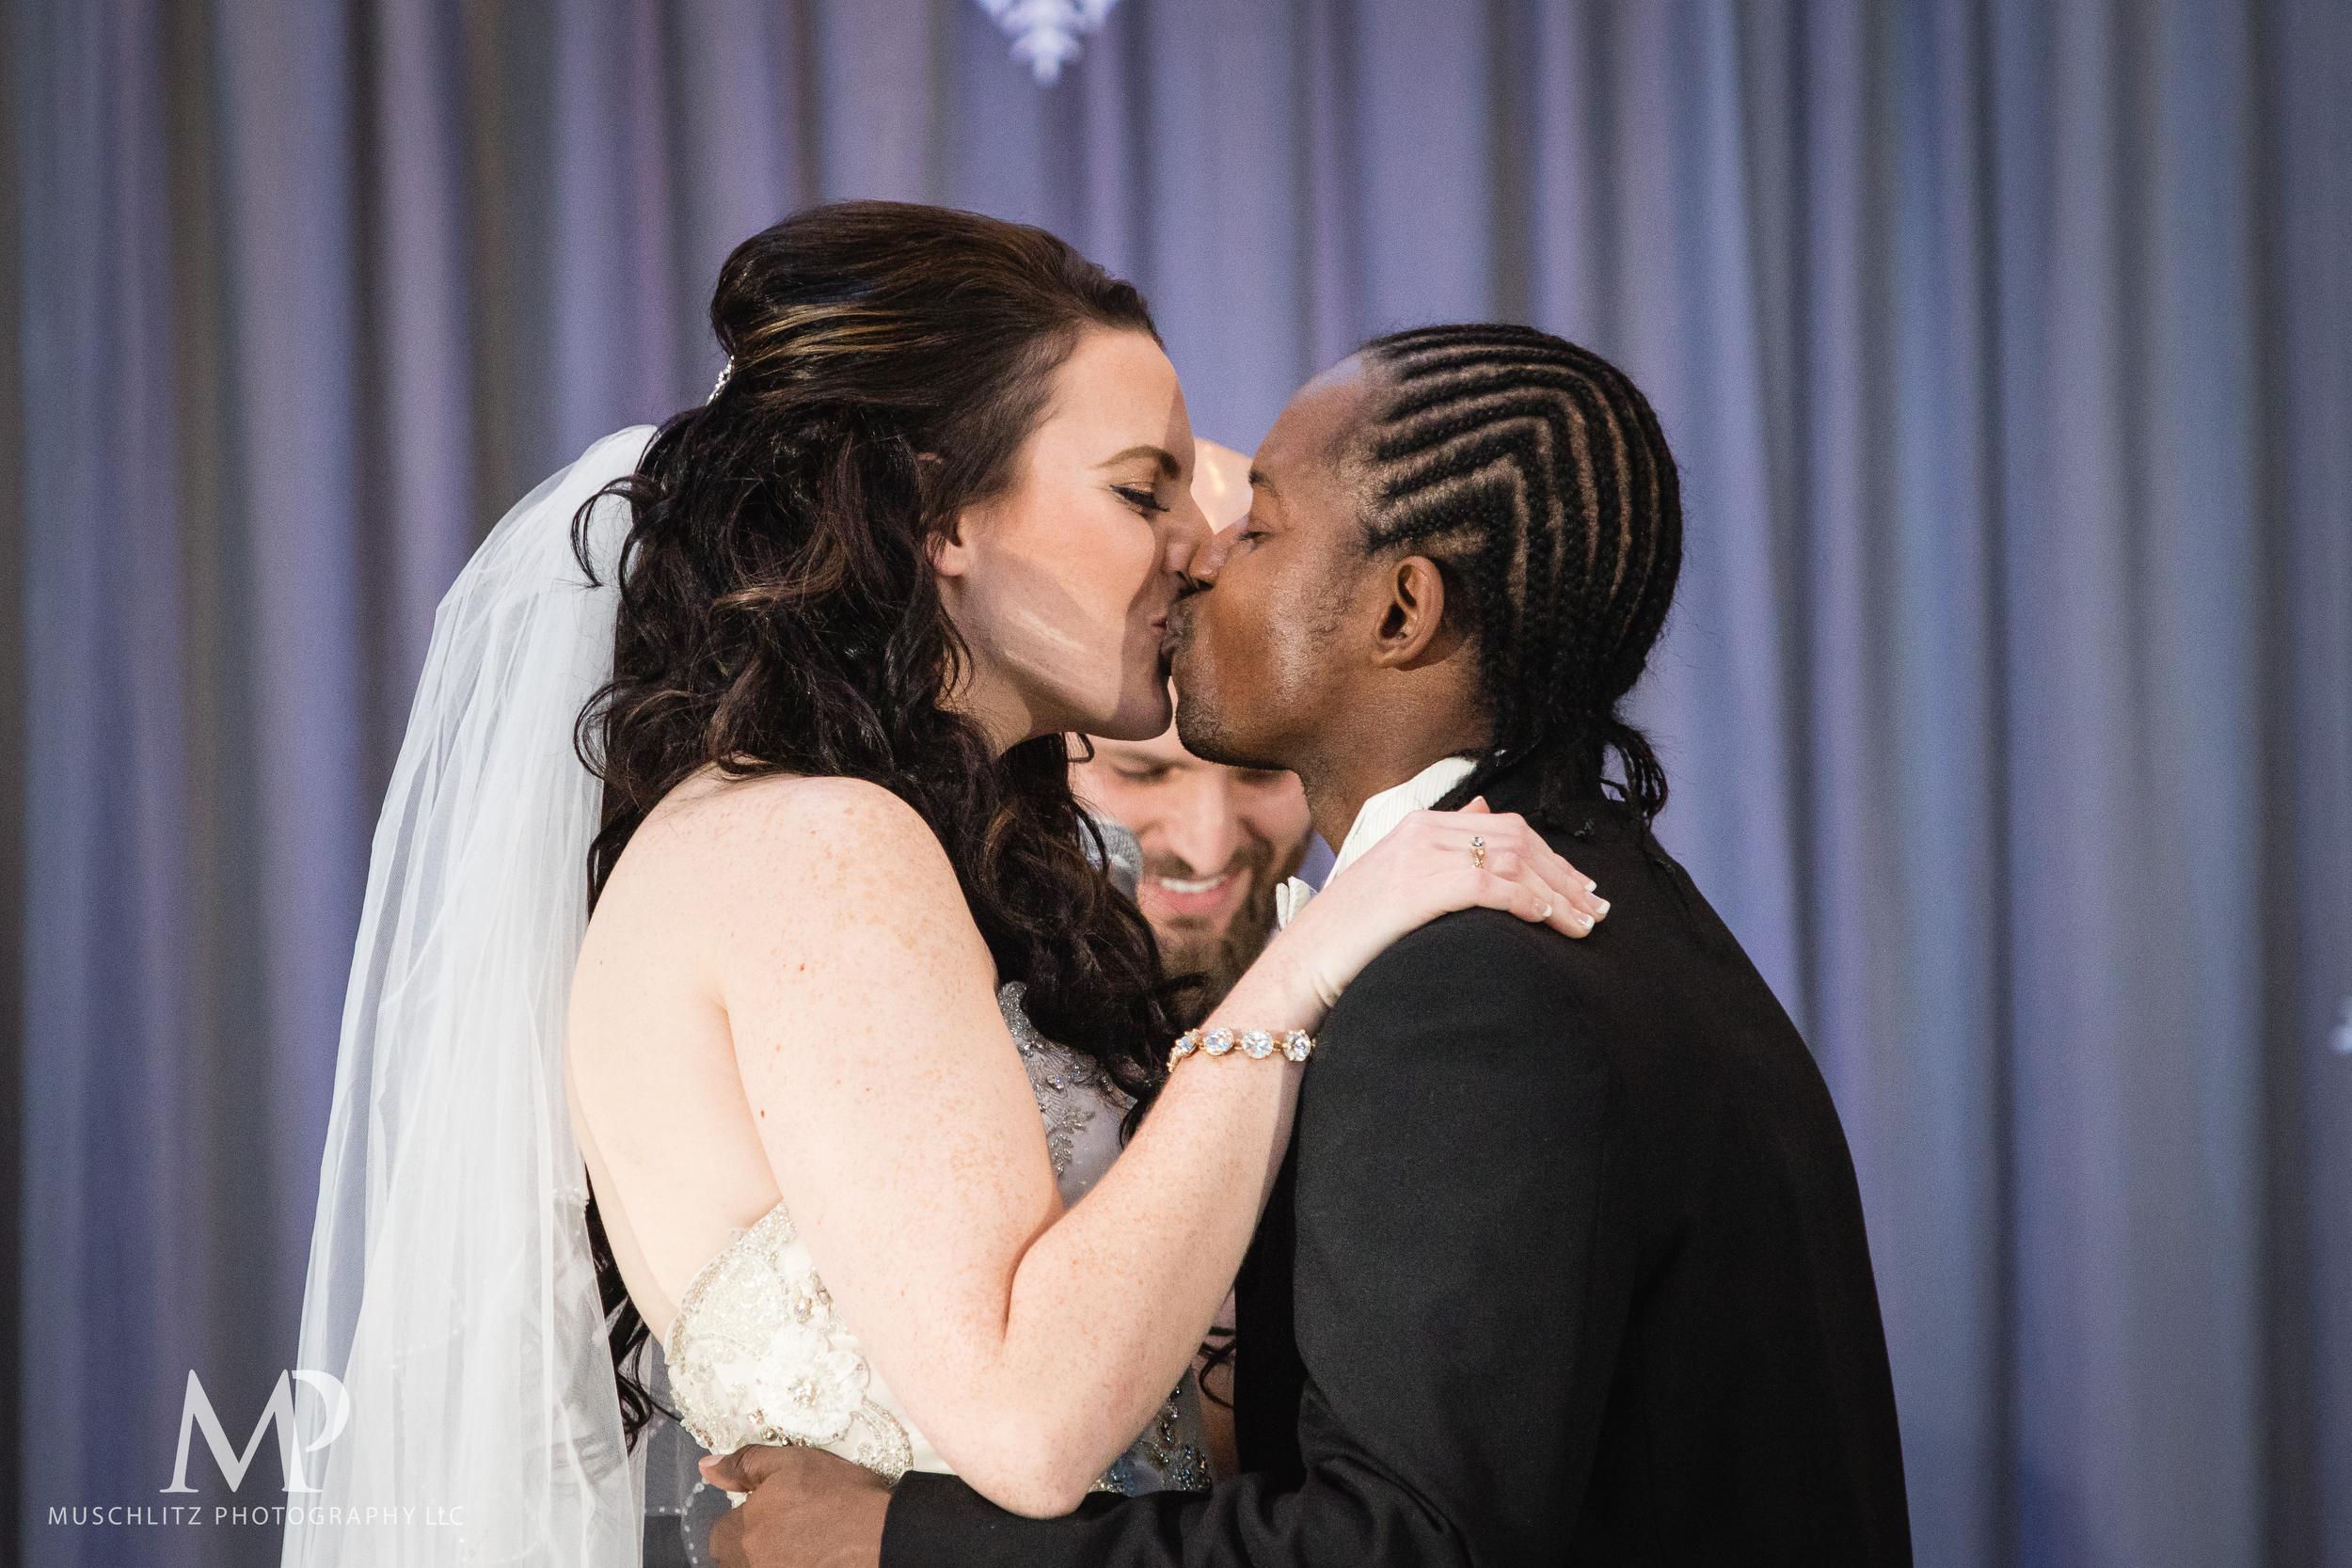 greater-columbus-convention-center-winter-wedding-ceremony-reception-portraits-columbus-ohio-muschlitz-photography-031.JPG